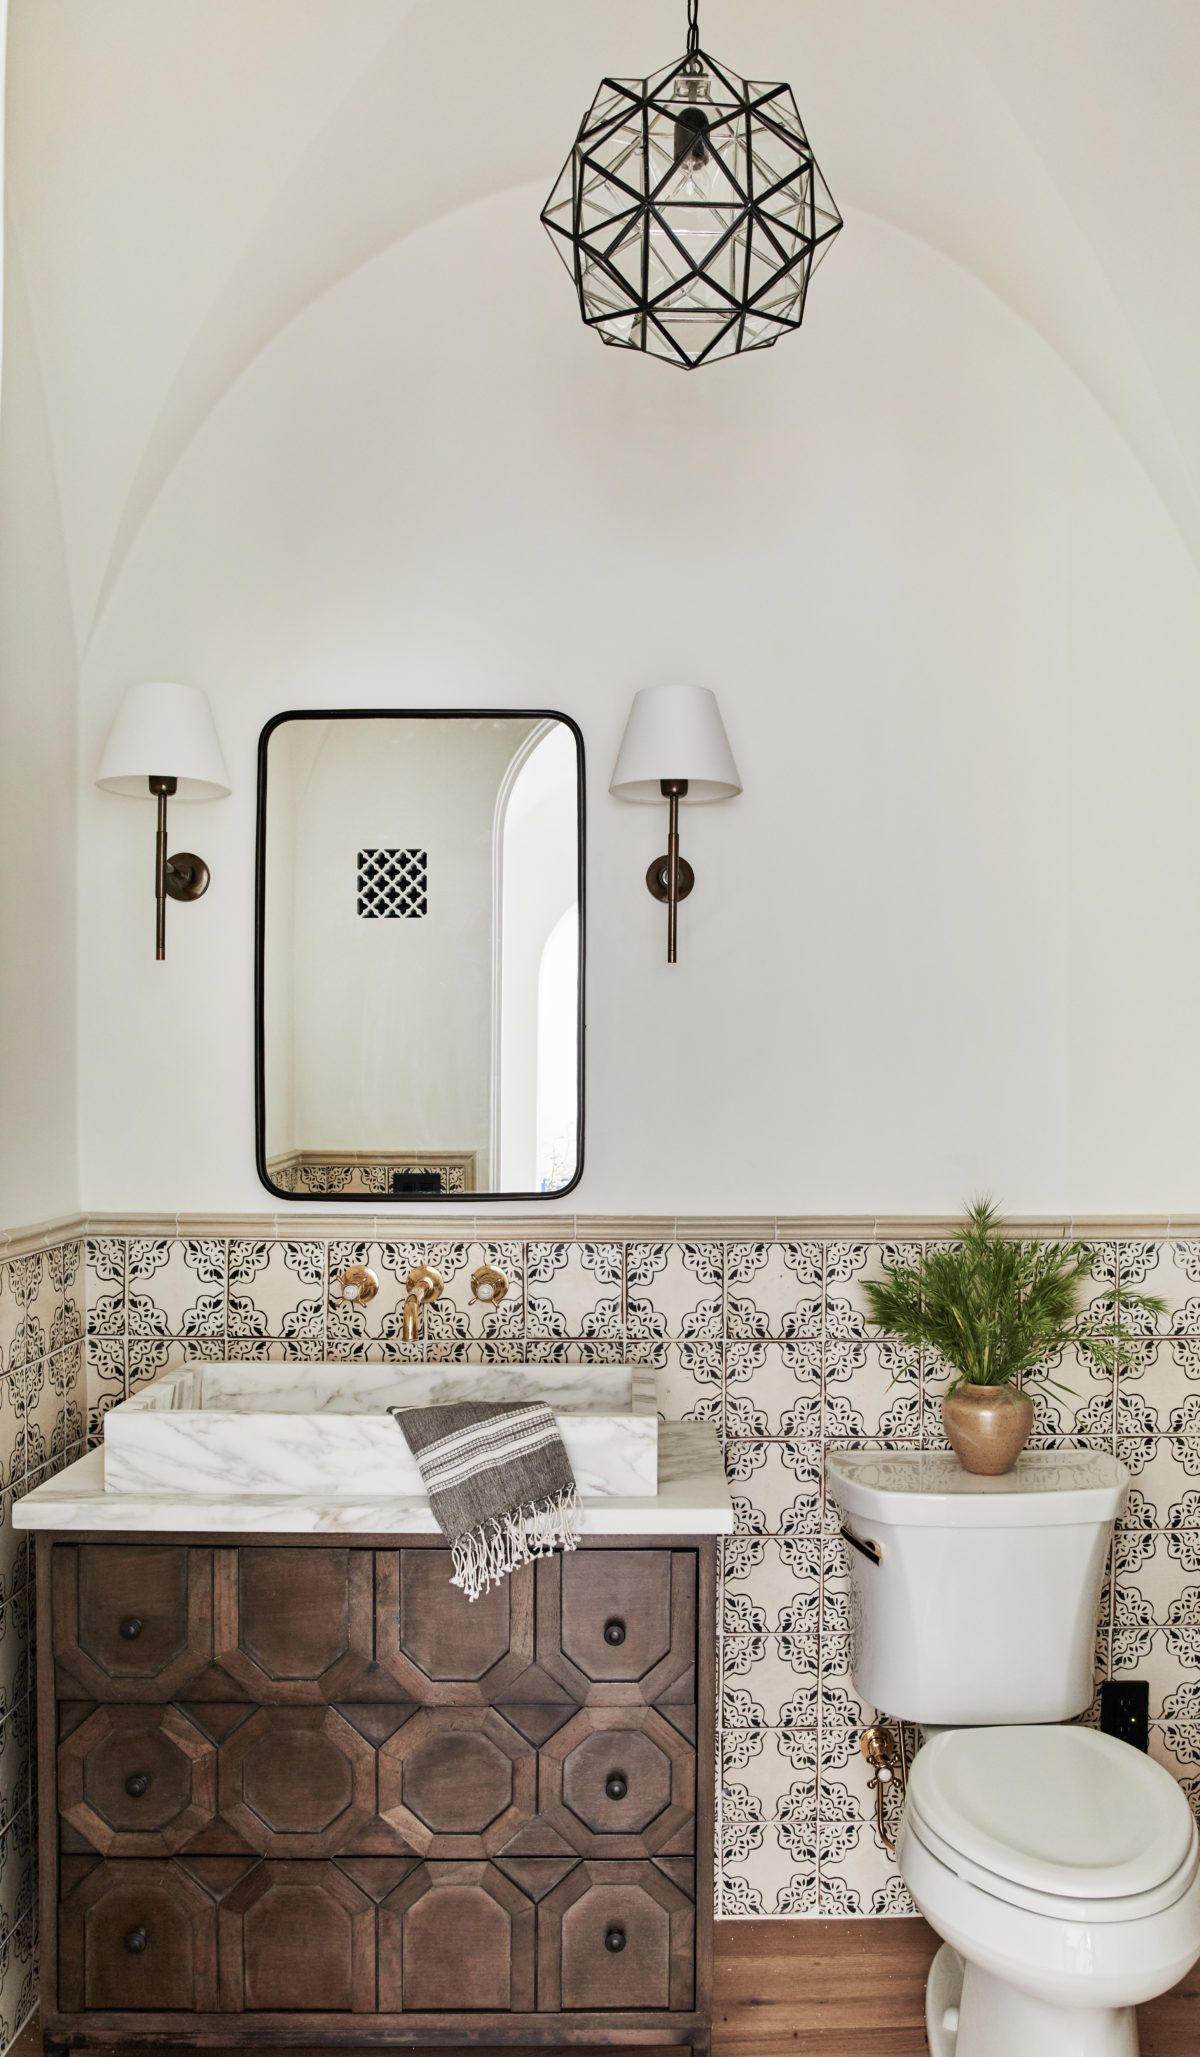 Pin By Sofie H Gordon On Fabulousness Spanish Style Bathrooms Spanish Revival Home Spanish Bathroom